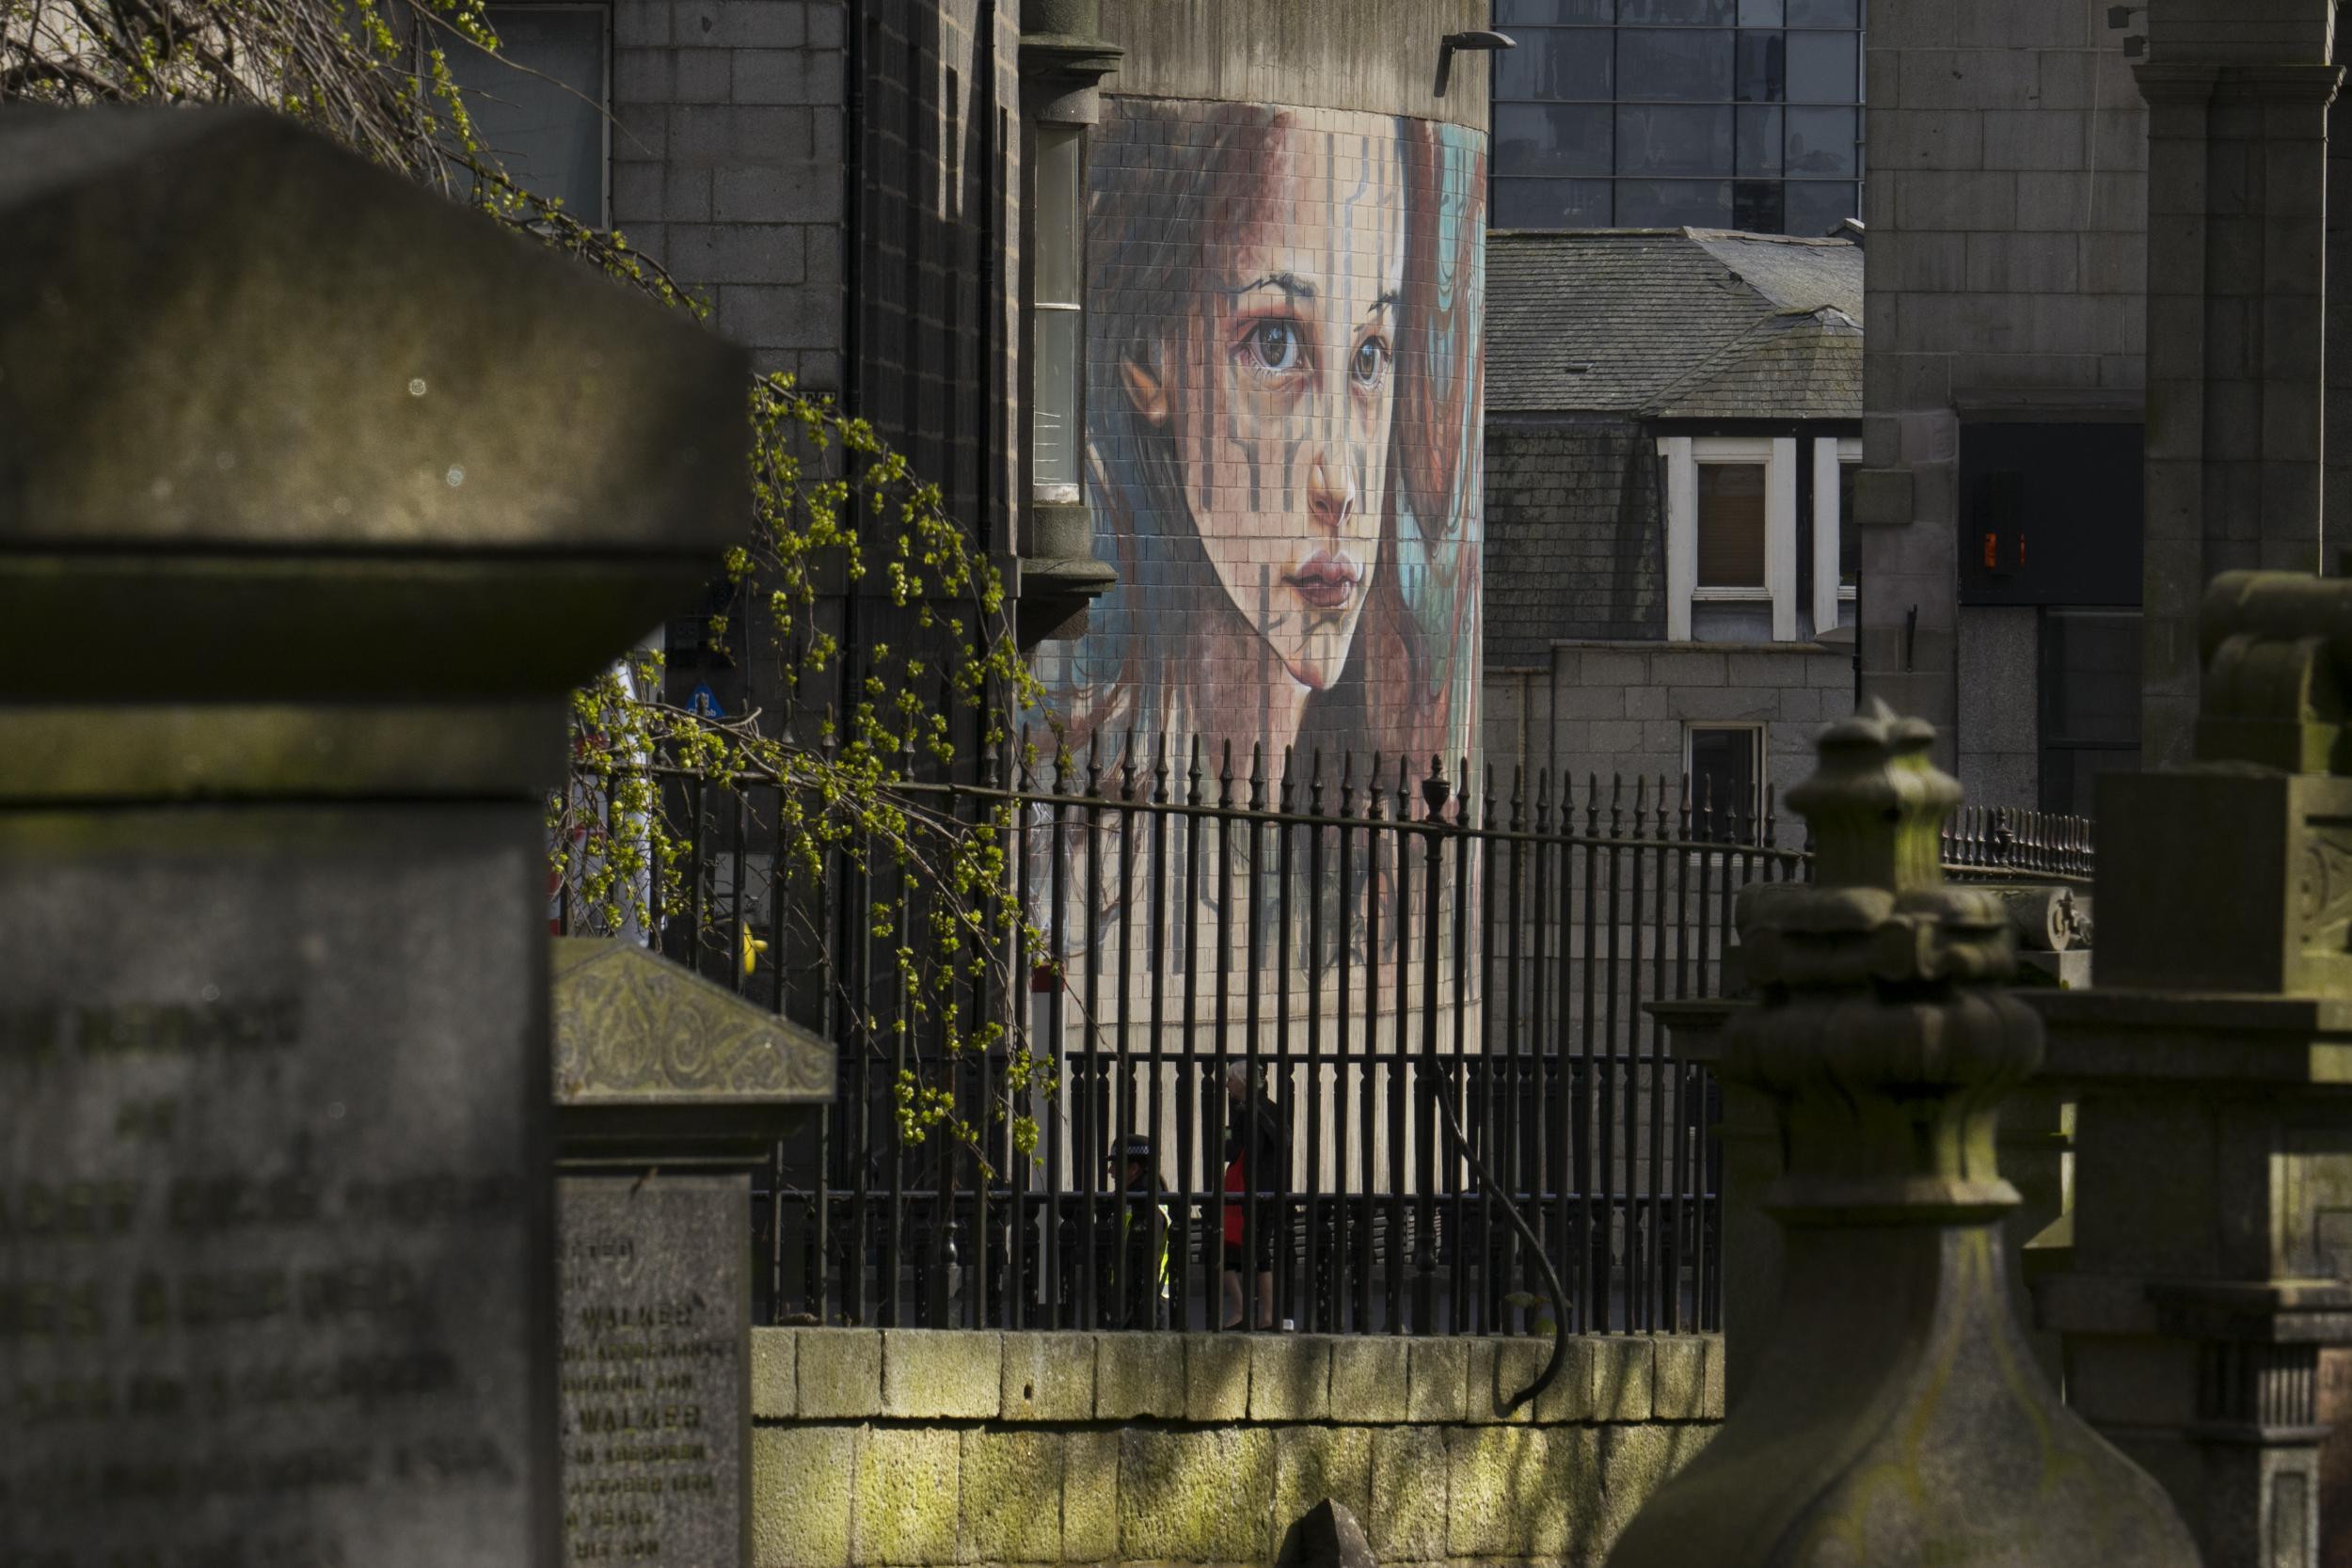 Aberdeen is the ideal arty city break destination